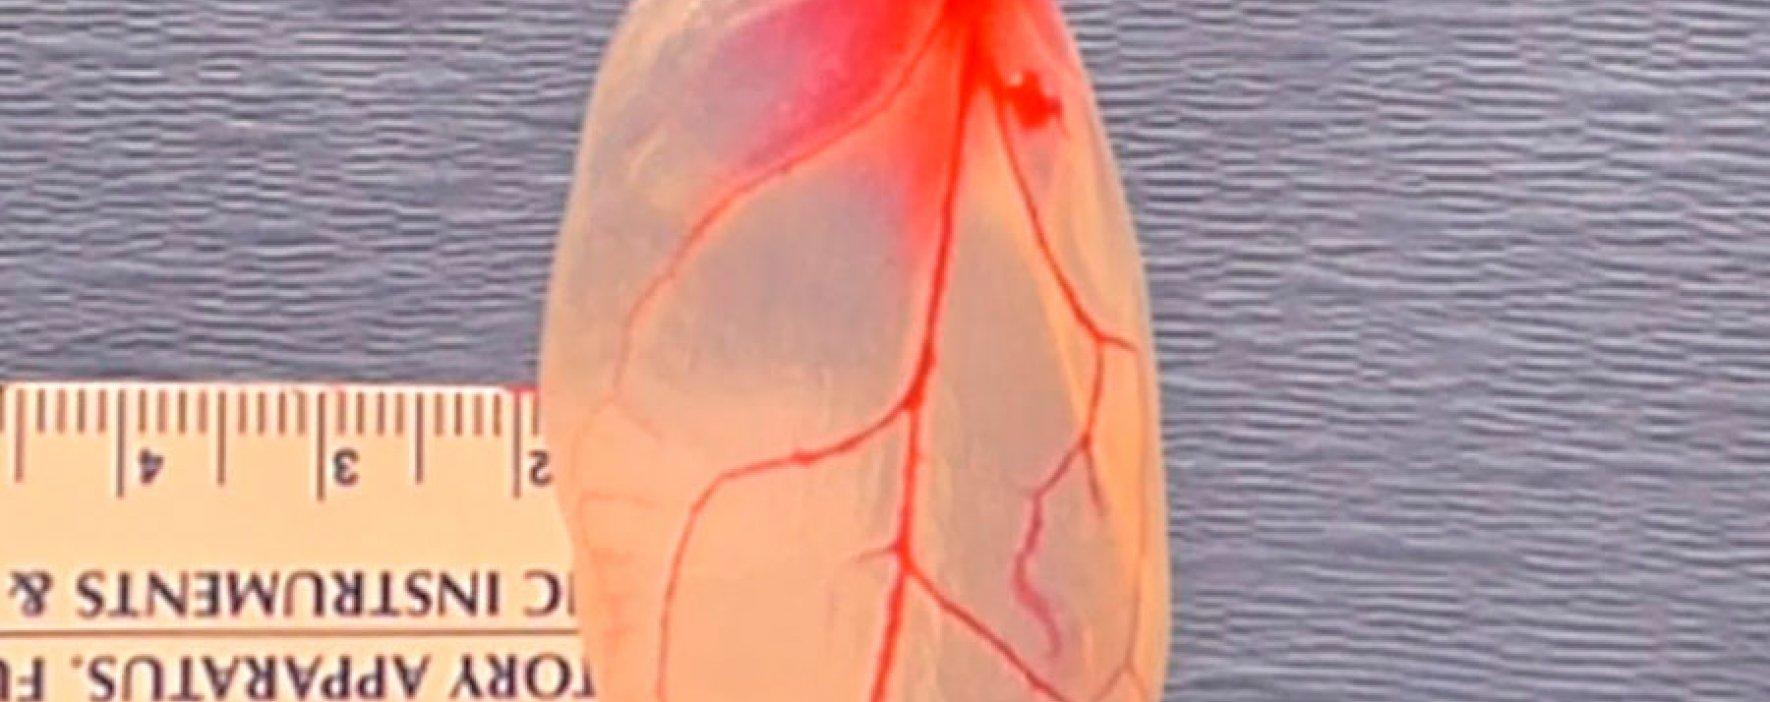 Técnica para diseñar órganos mediante células vegetales